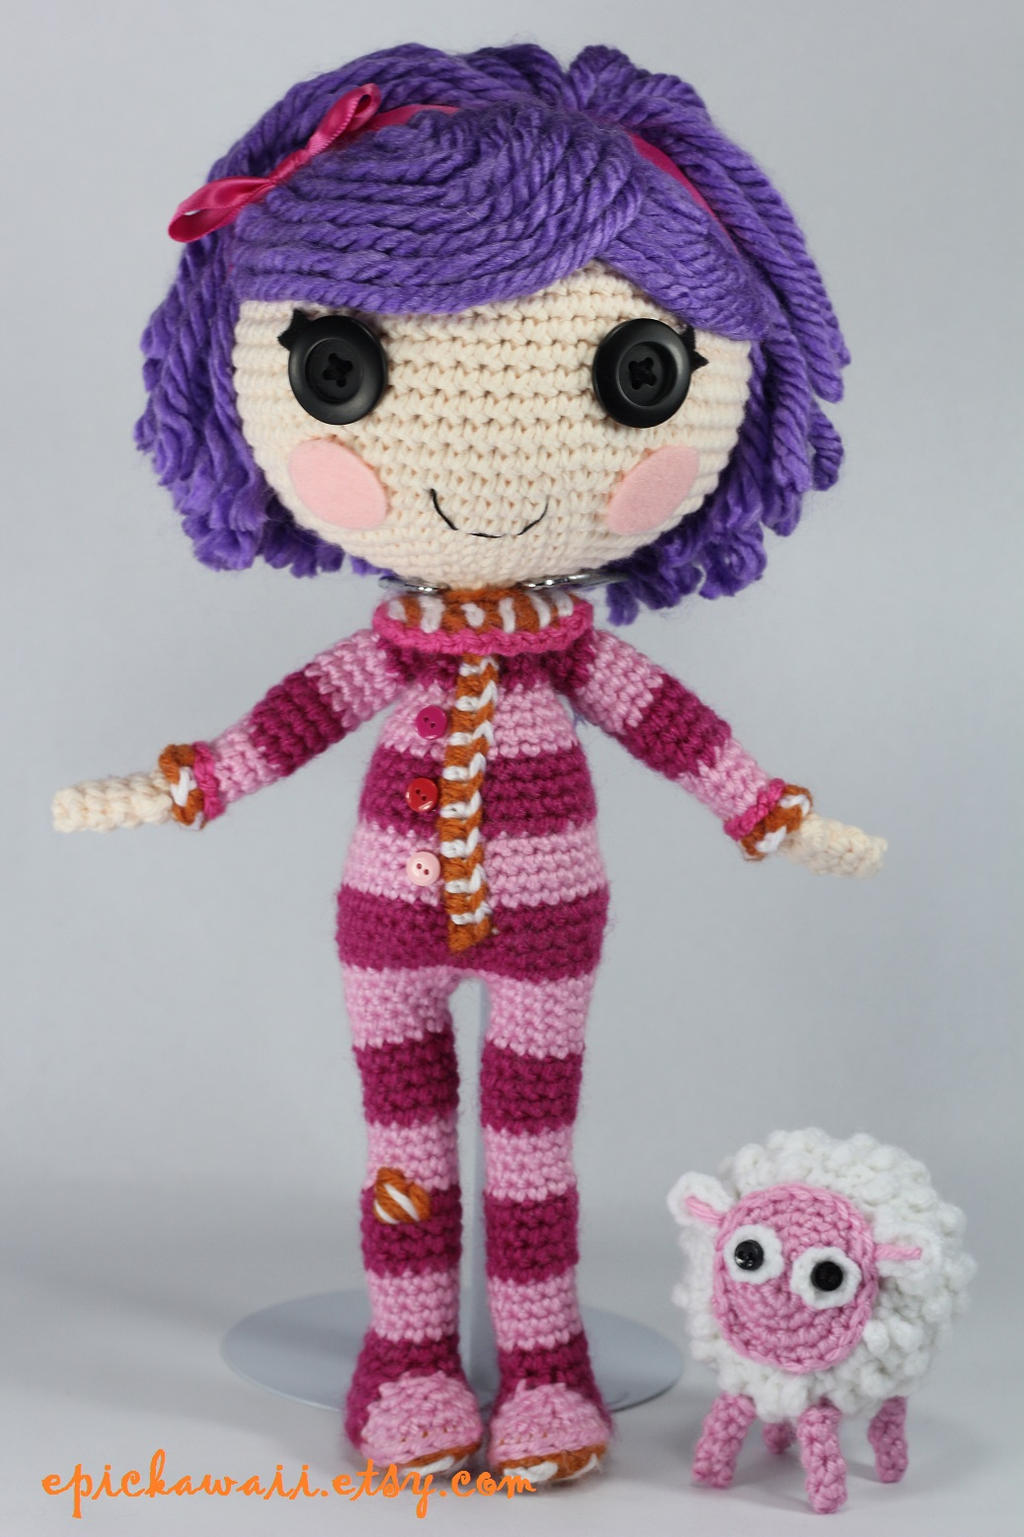 Lalaloopsy Inspired Doll | Crochet dolls, Crochet doll pattern ... | 1537x1024